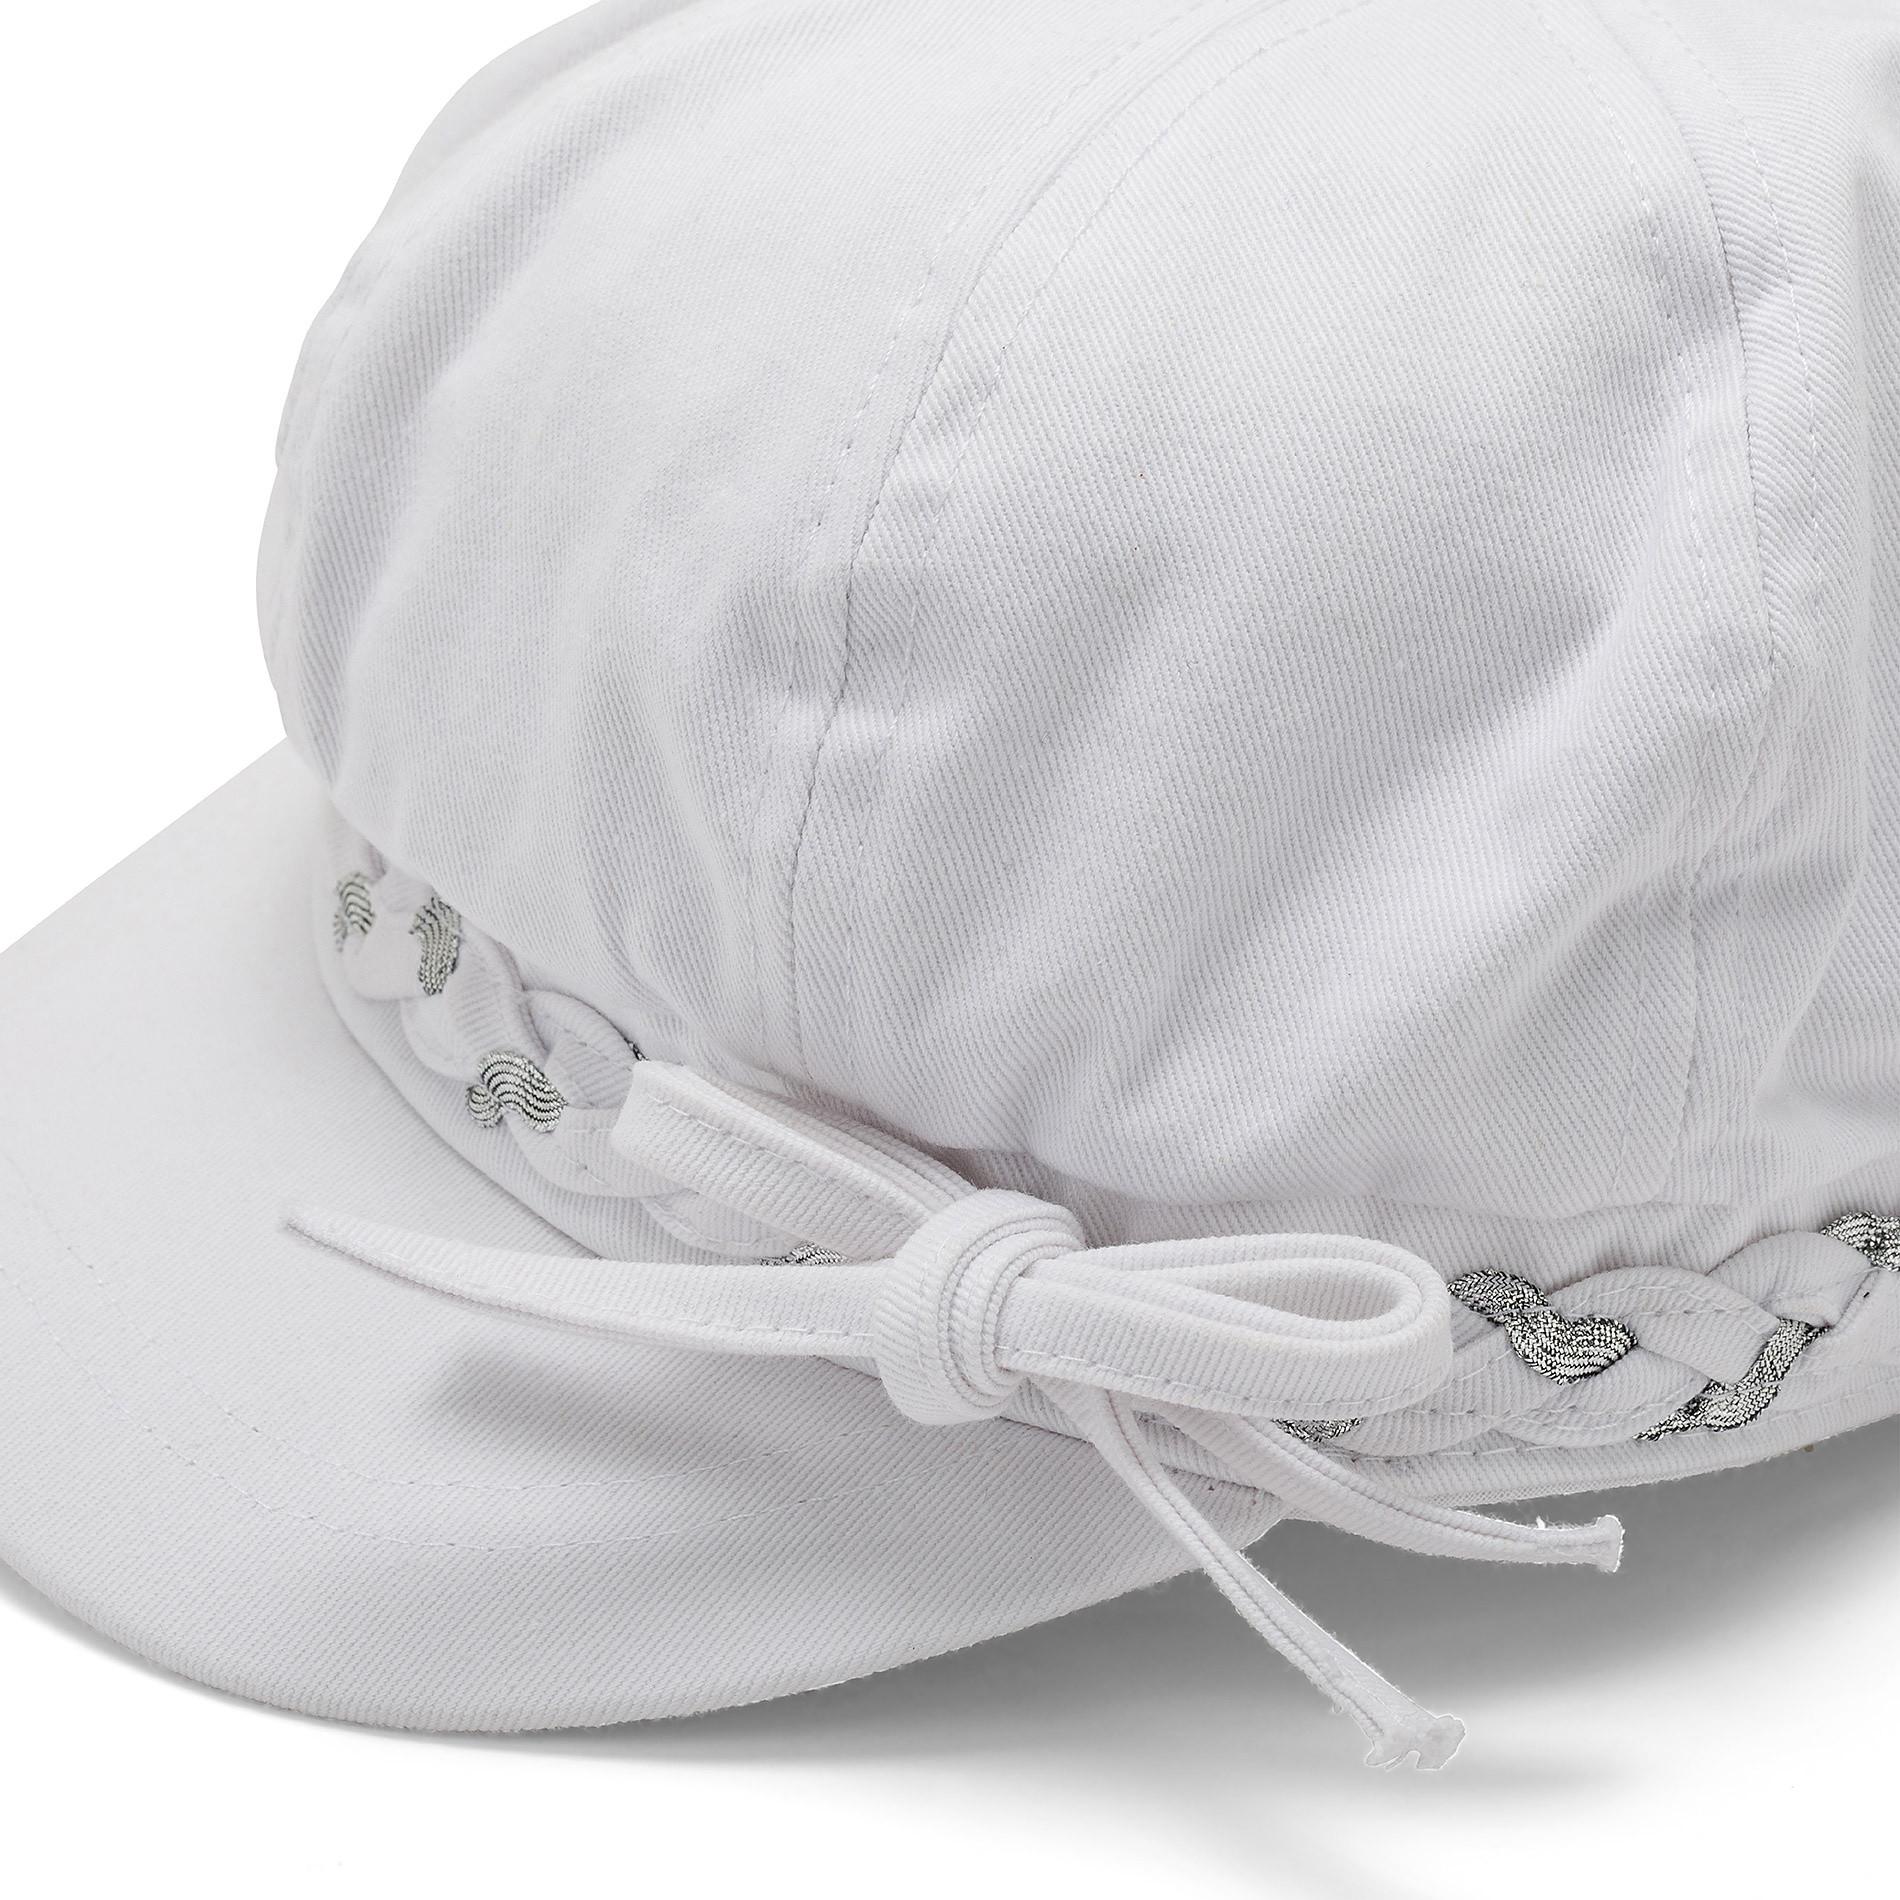 Berretto a treccina Koan, Bianco, large image number 1